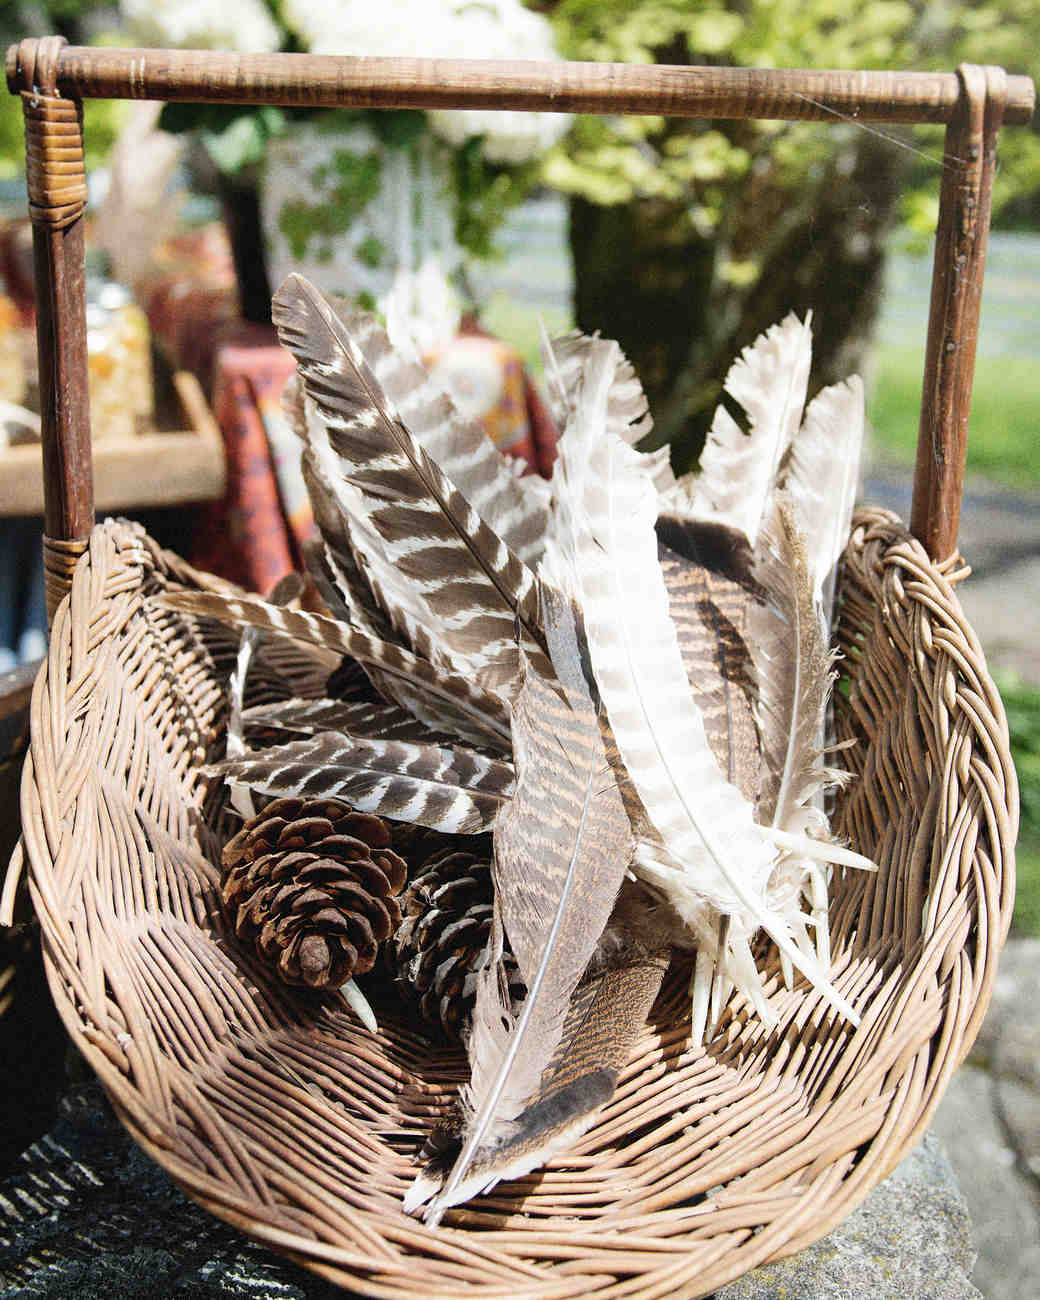 scavenger-hunt-bridal-shower-feathers-decor-0315.jpg